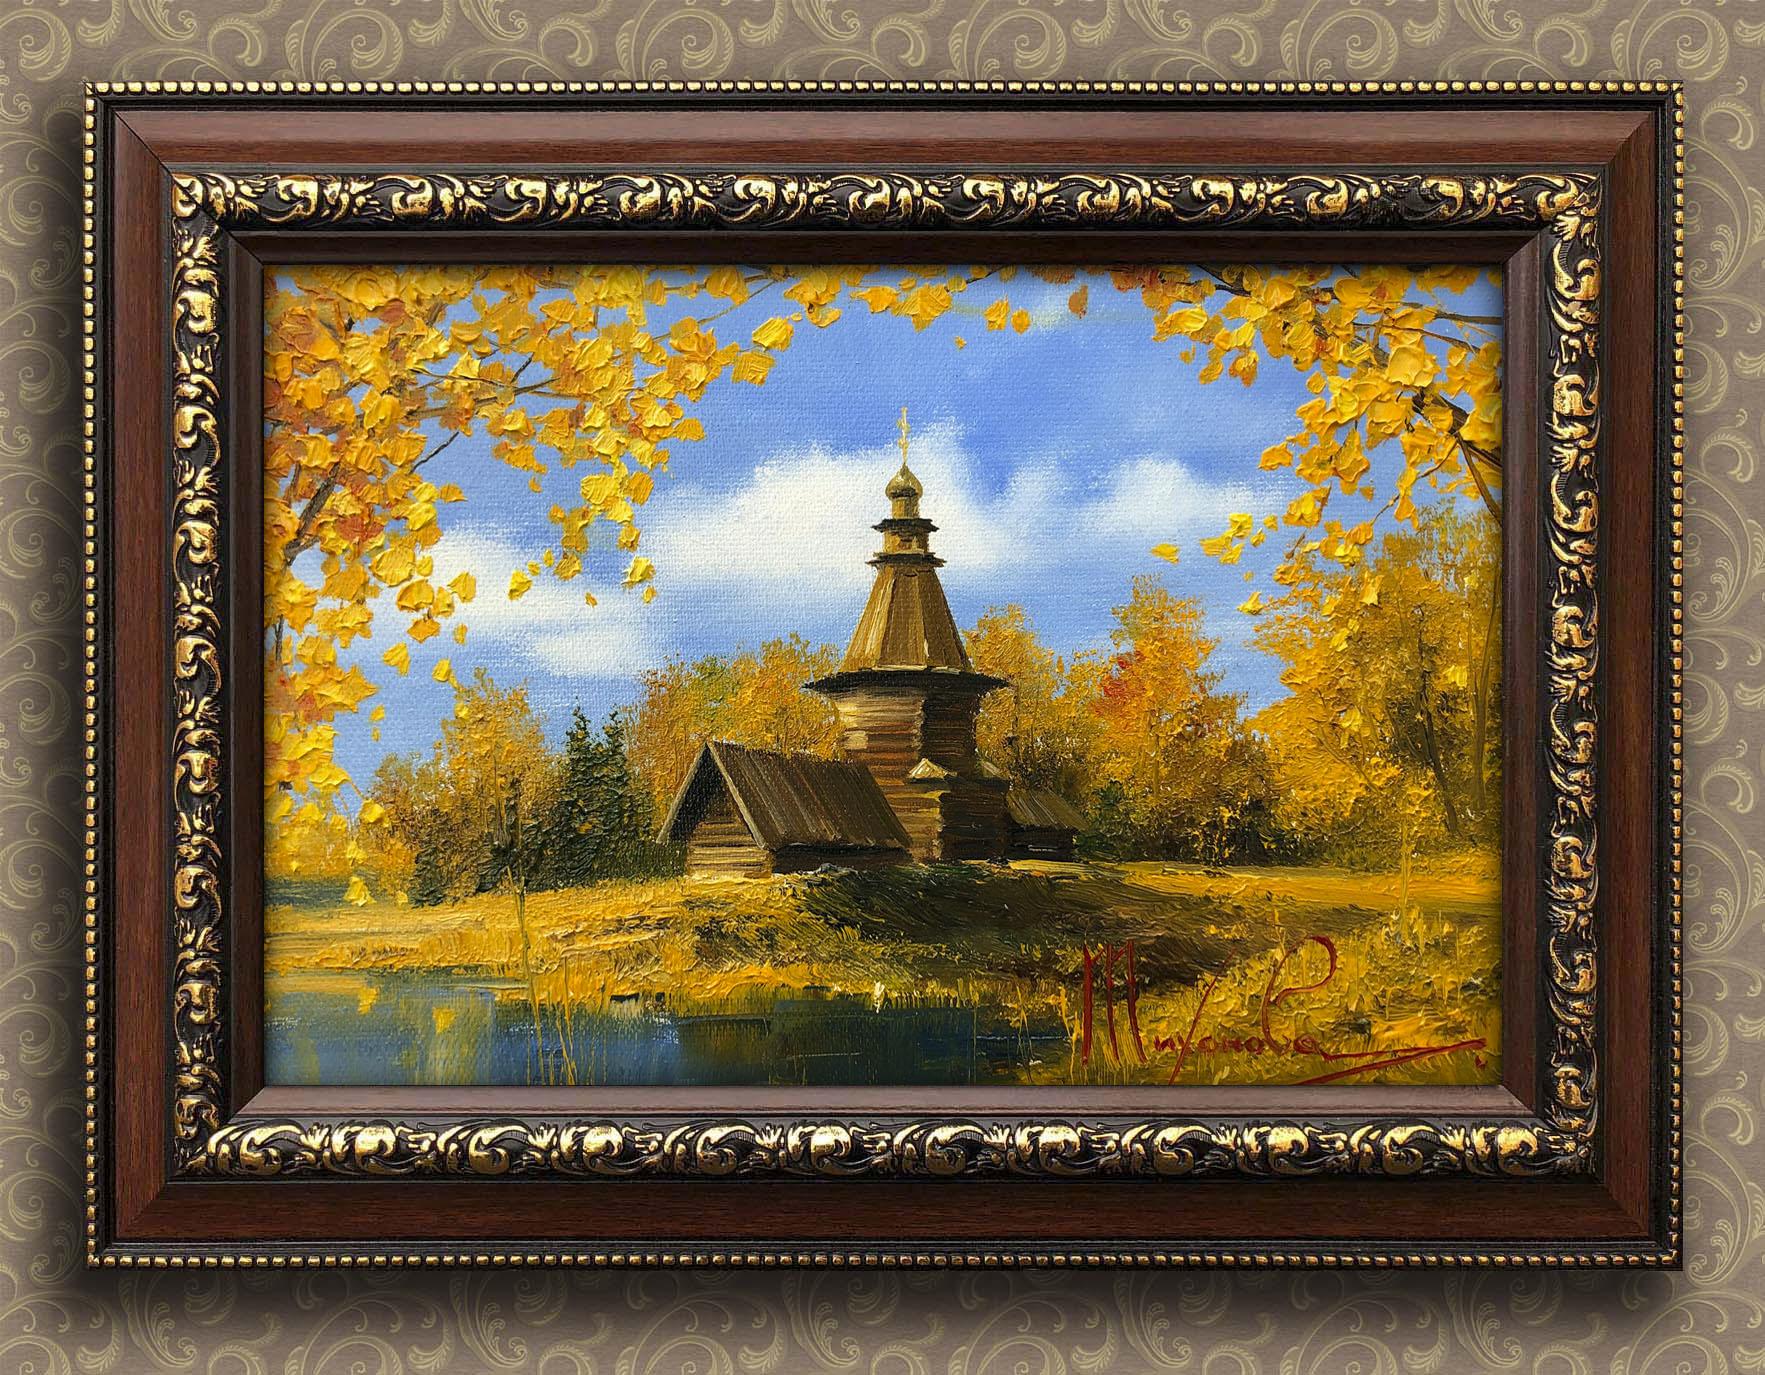 Осень пришла Тихонова Любовь